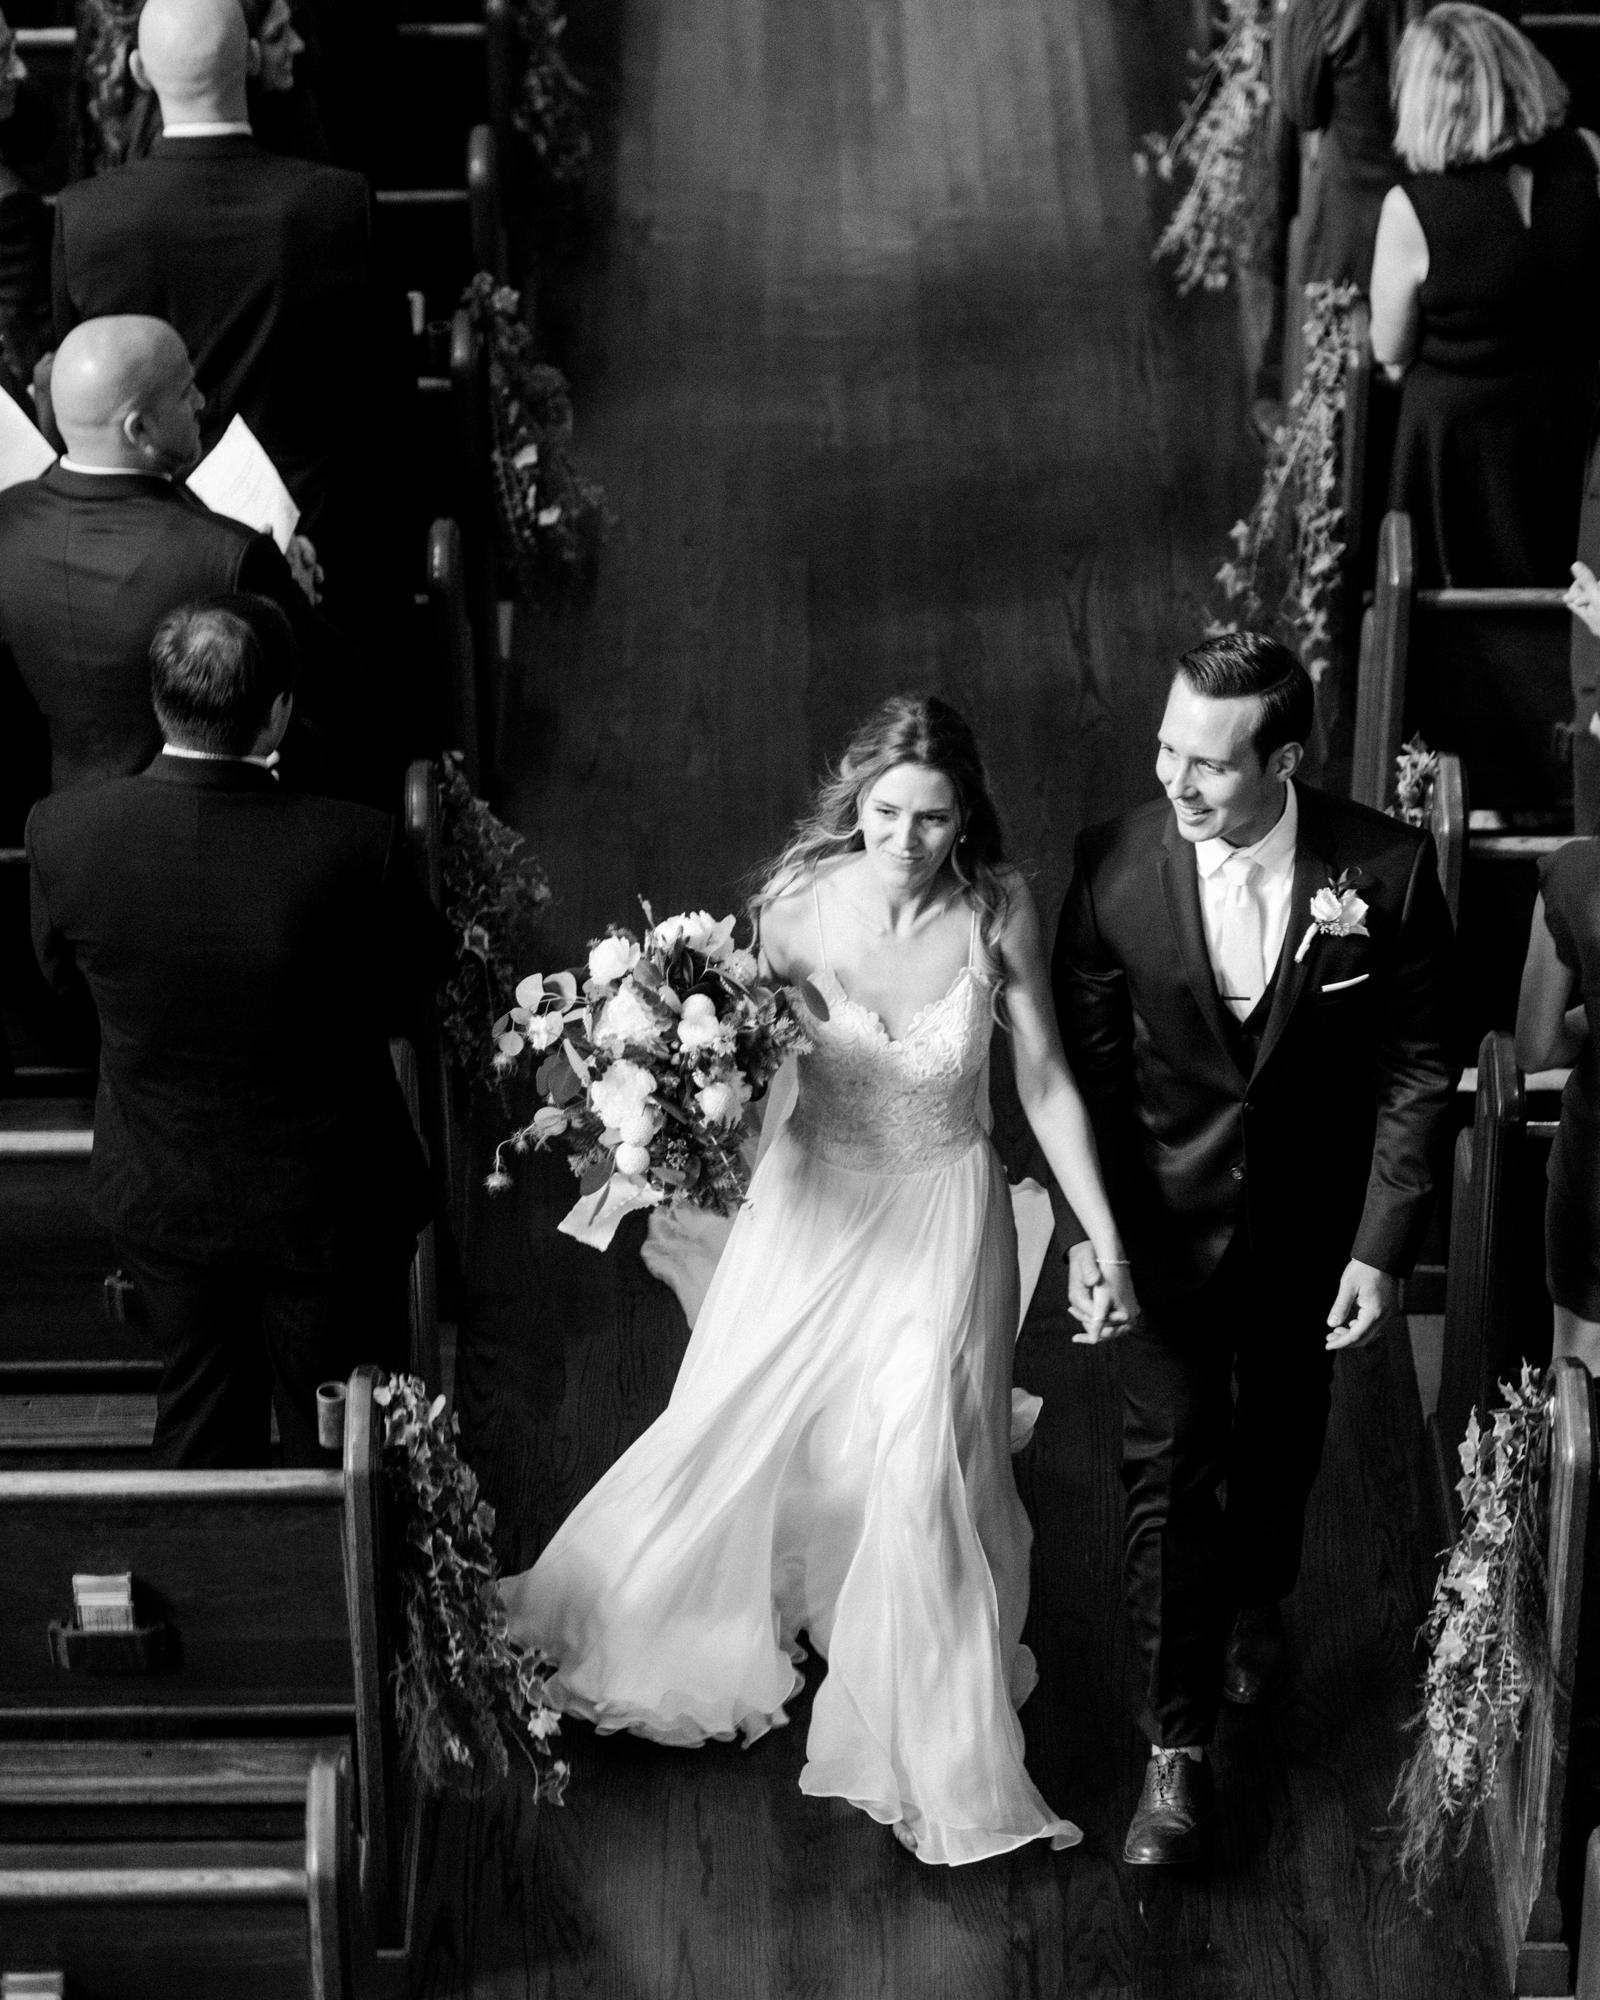 LongView-Gallery-Wedding-Art-Washington-DC-Film-Photographer-33.jpg